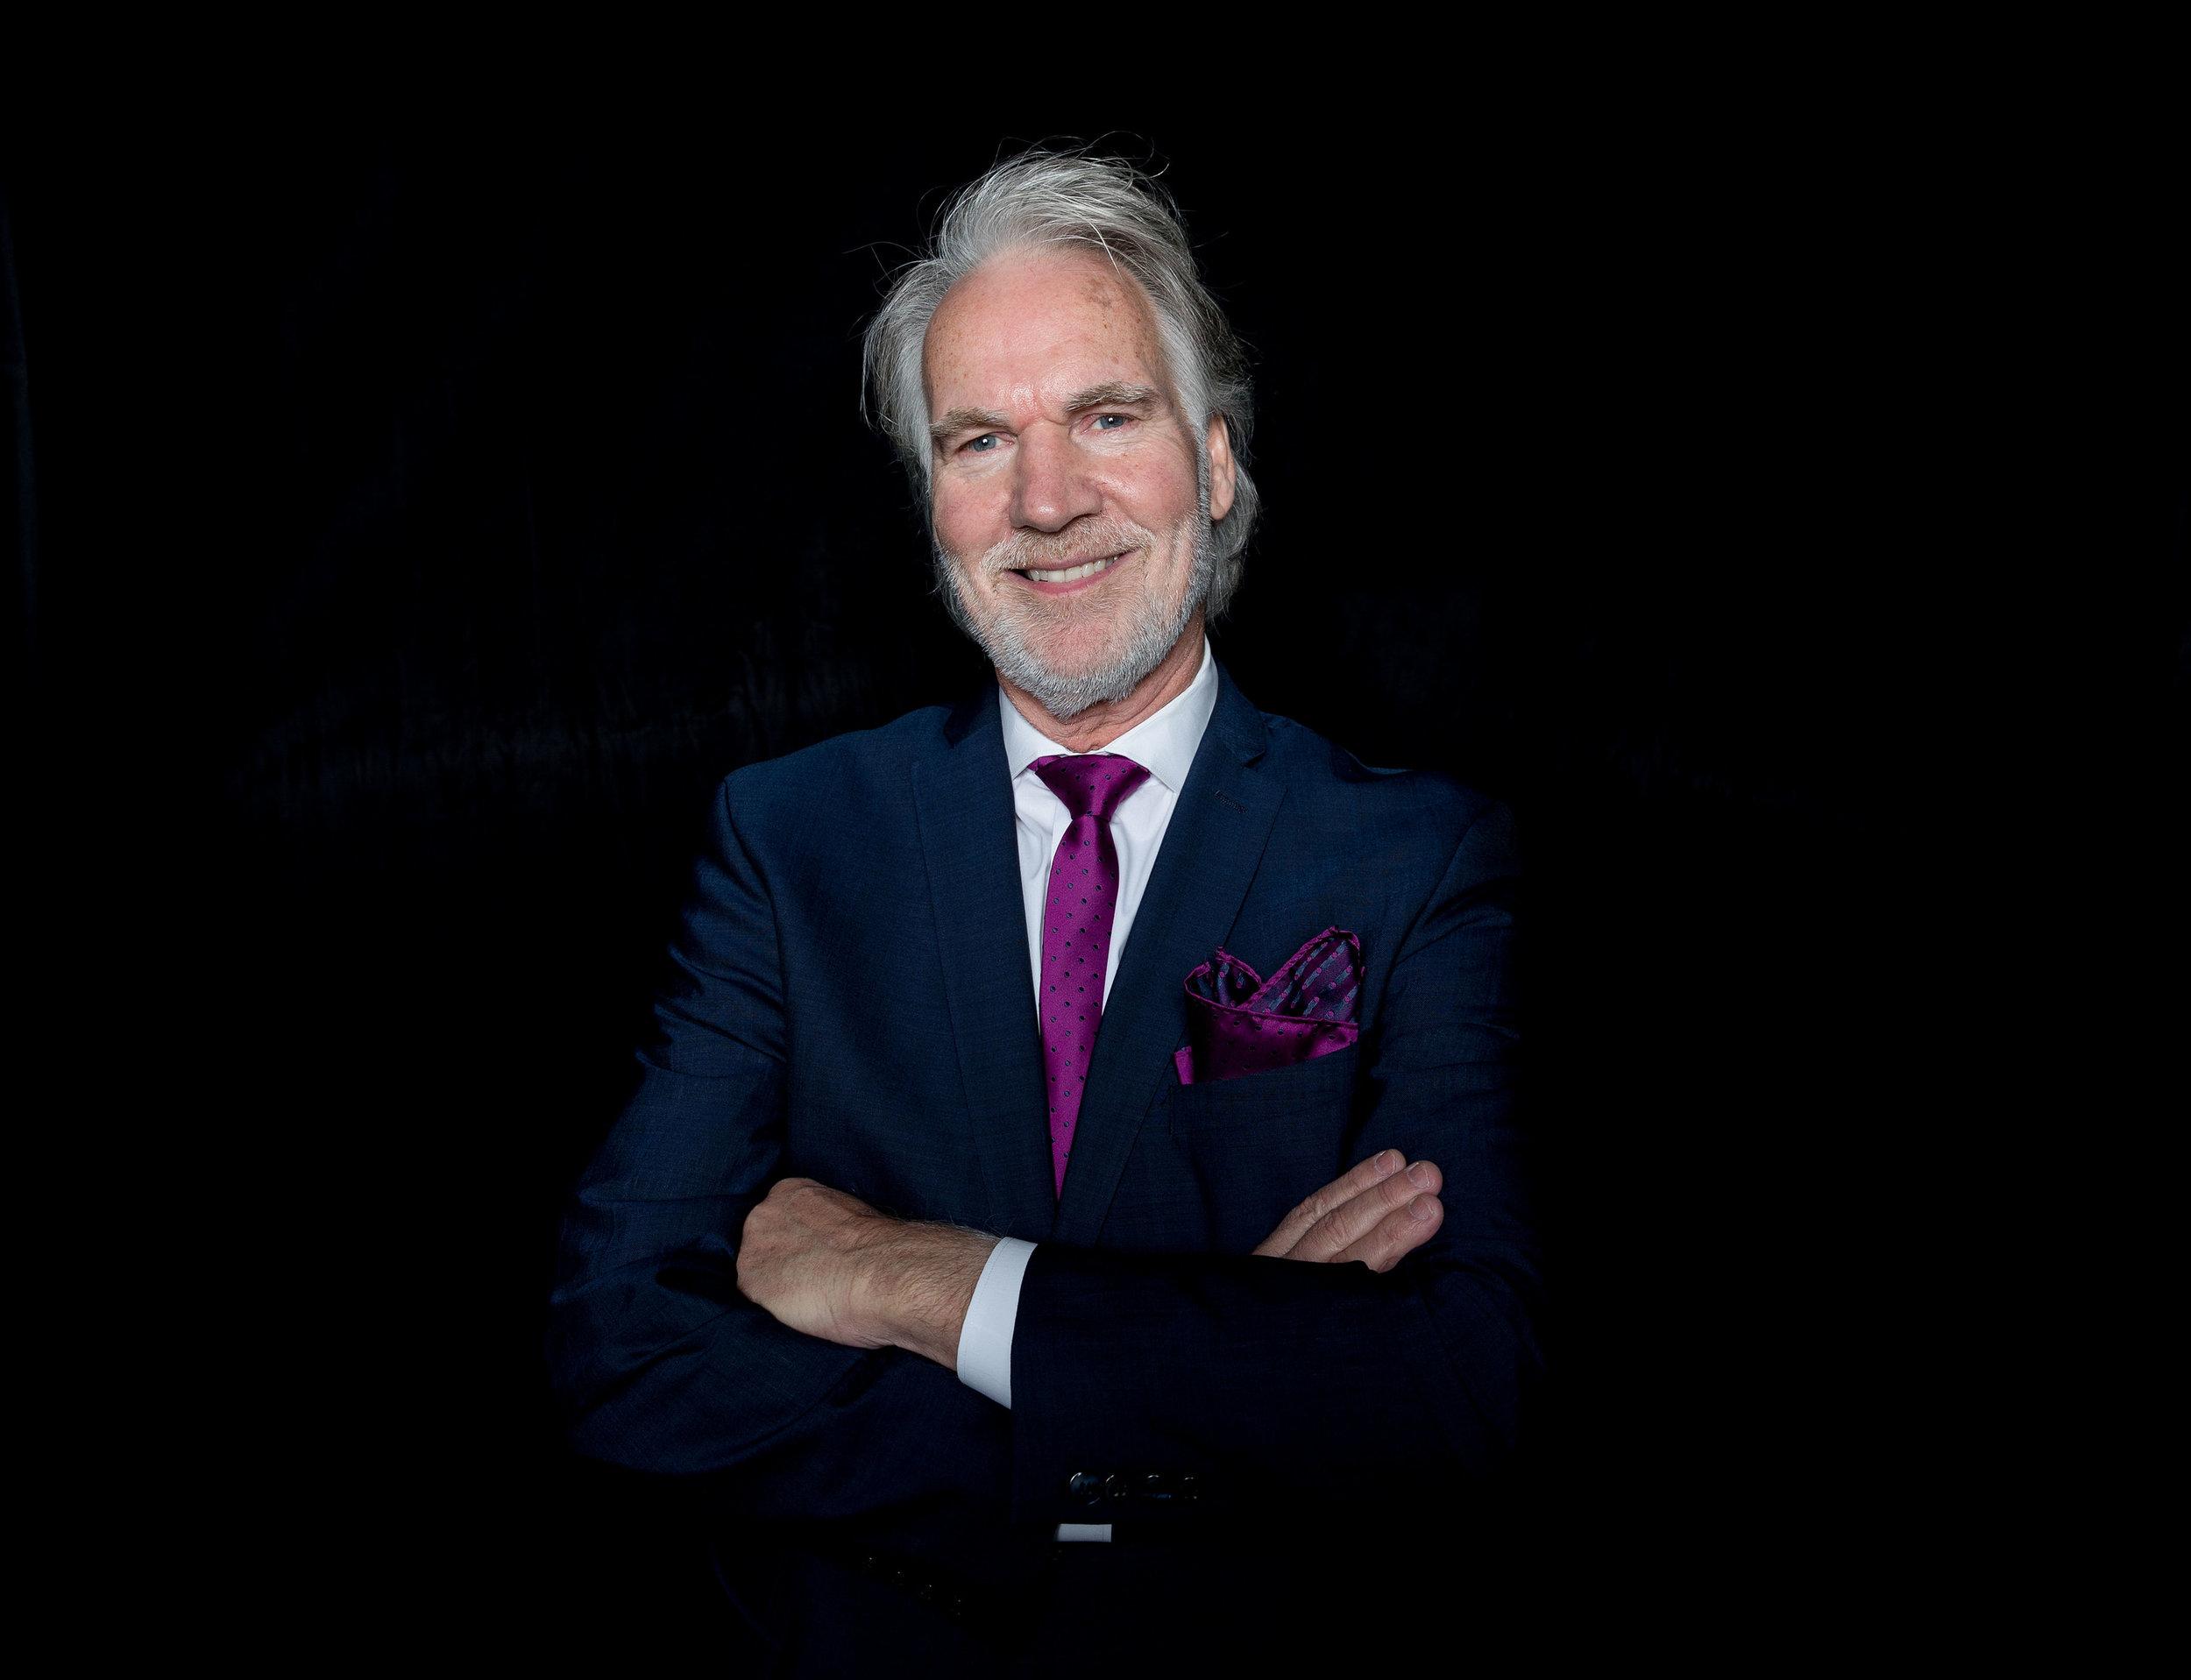 Matt Davenport - President/CEO